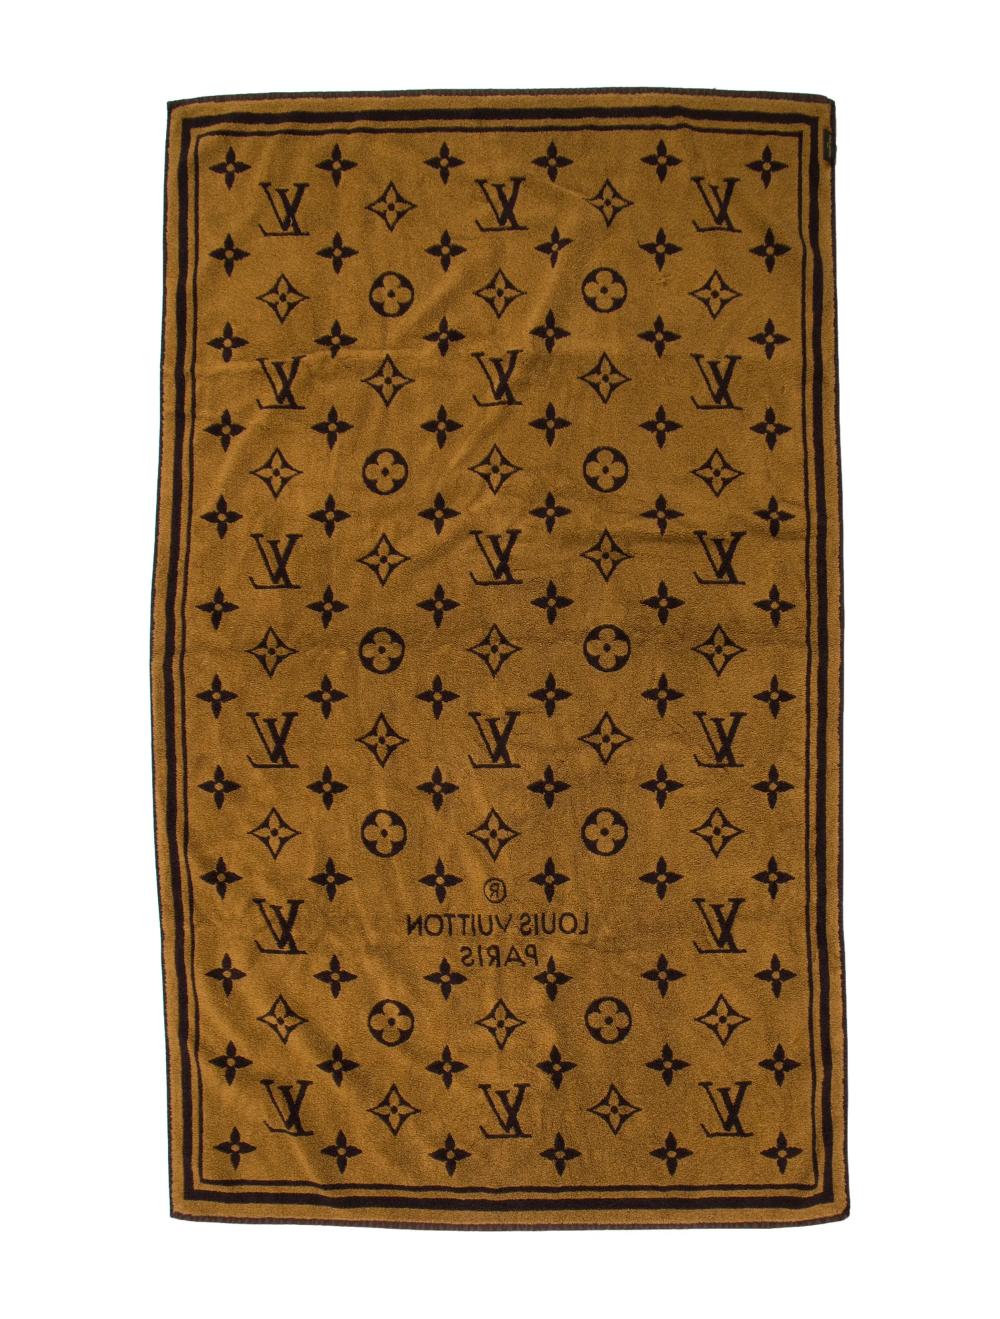 Louis Vuitton Svg Lv Bundle Brand Logo Svg Louis Vuitton Etsy Louis Vuitton Pattern Louis Vuitton Svg